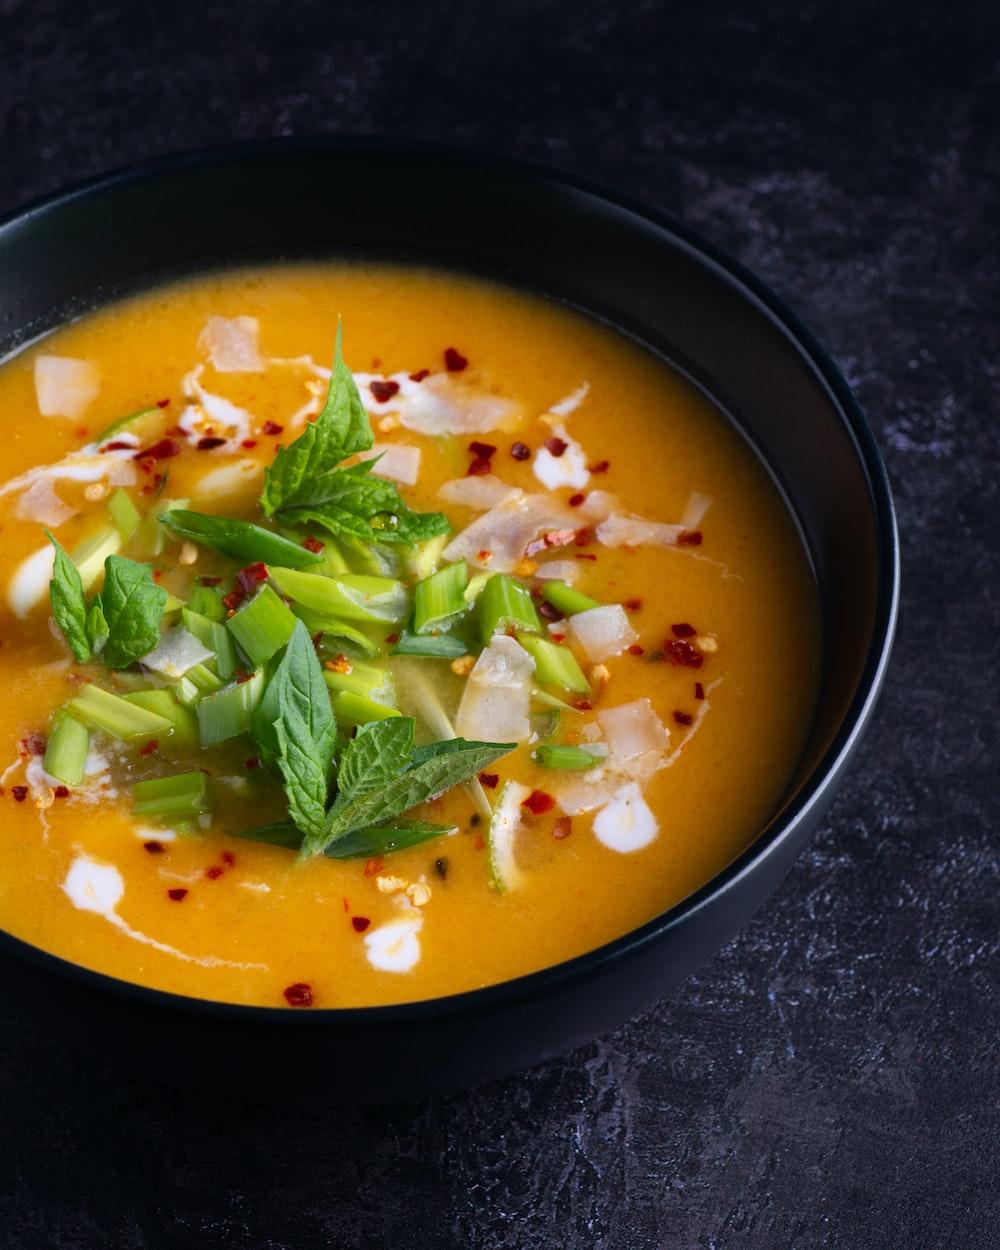 soup with green leaf on black ceramic bowl